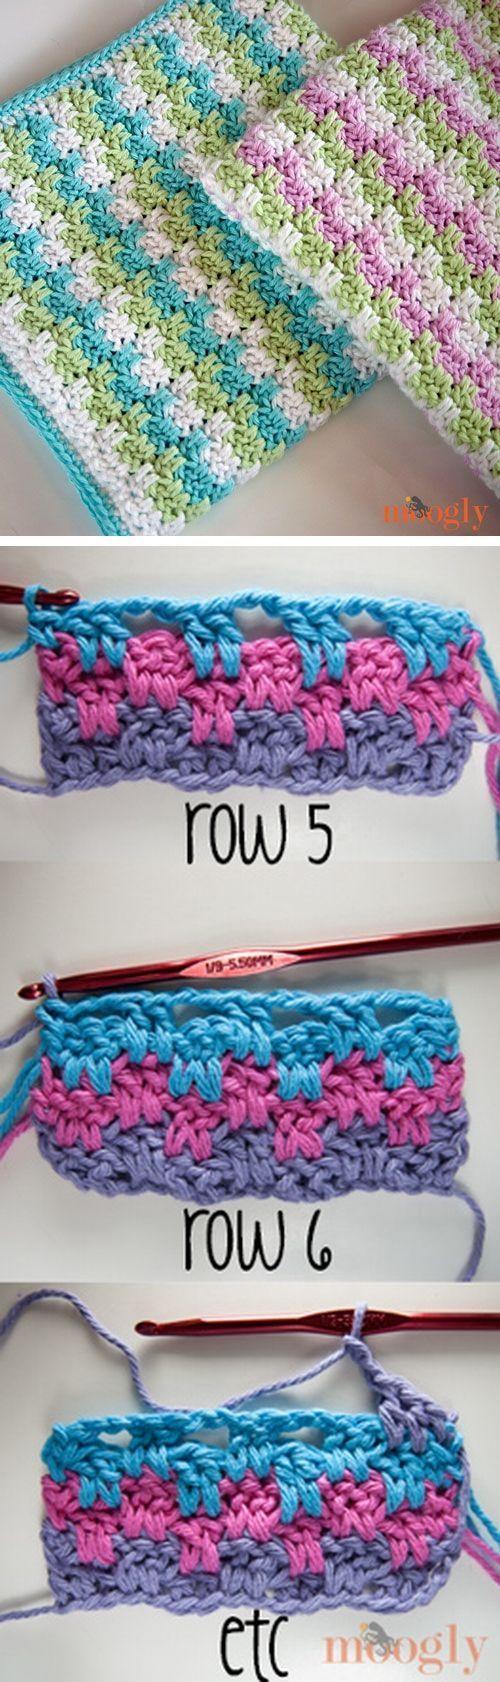 Classy Crochet Patterns: Leaping Stripes & Blocks blanket